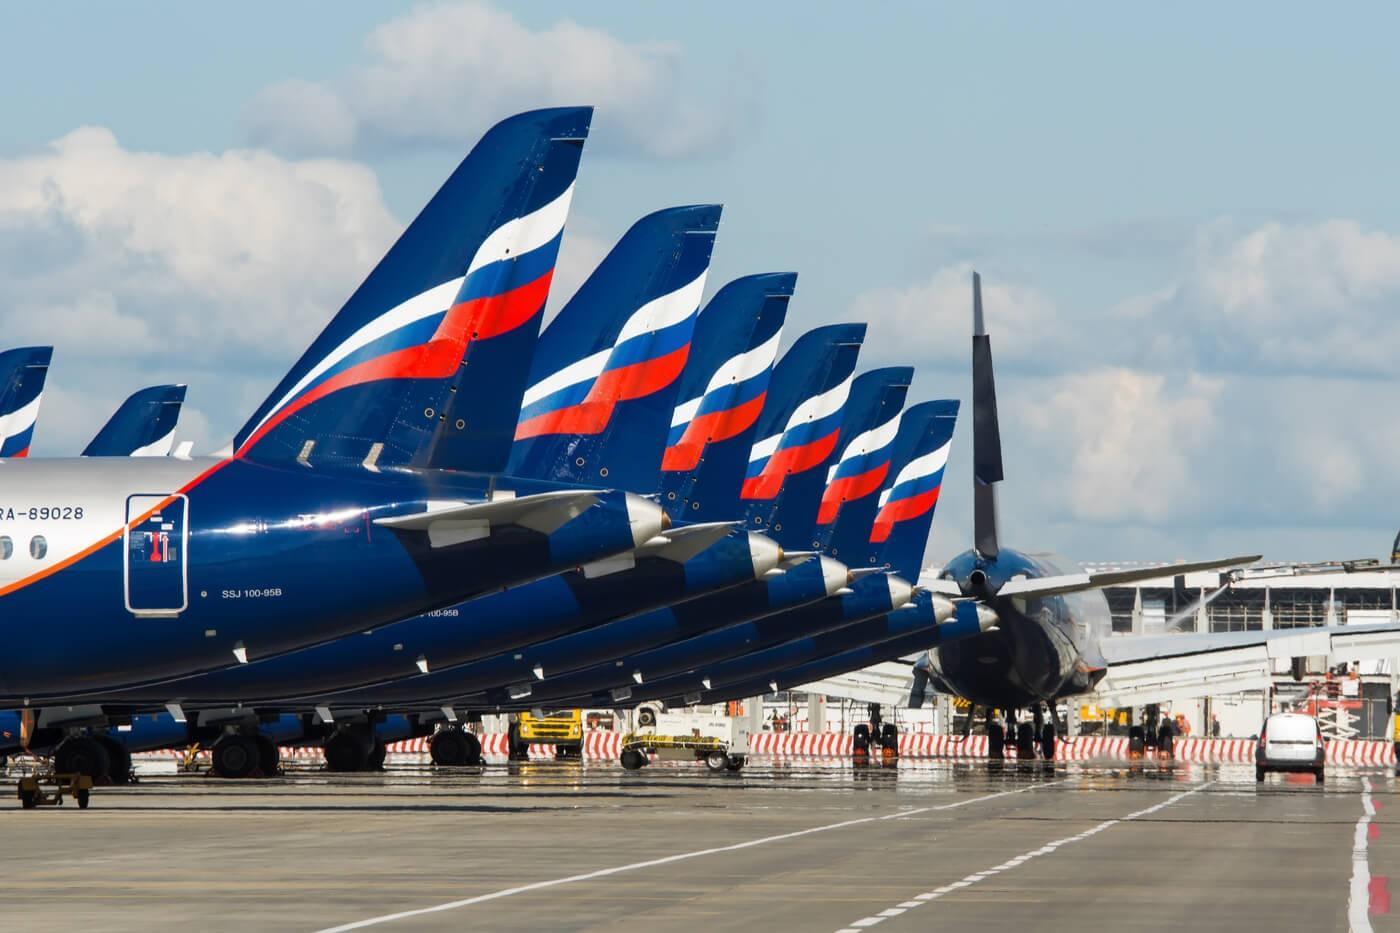 Photo of Ռոսավիացիան ռուսական ավիաընկերություններին դեպի Հայաստան չվերթերի թույլտվություն է տվել. hetq.am